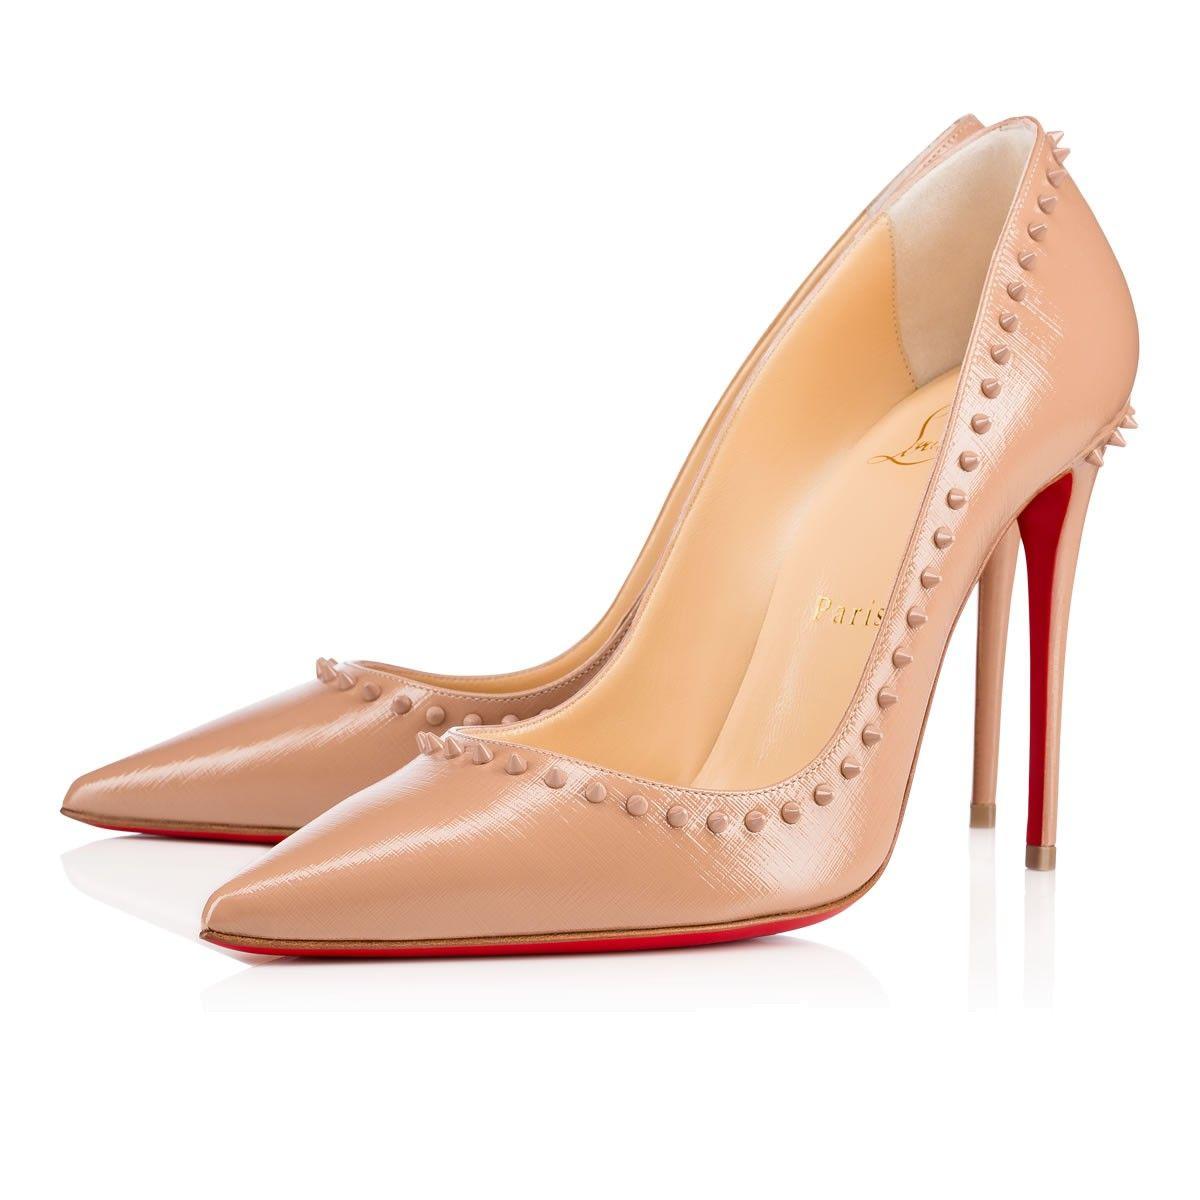 Womens Calzature Anjalina 85 Shoes Closed Toe Heels Christian Louboutin rmJfrHPkz